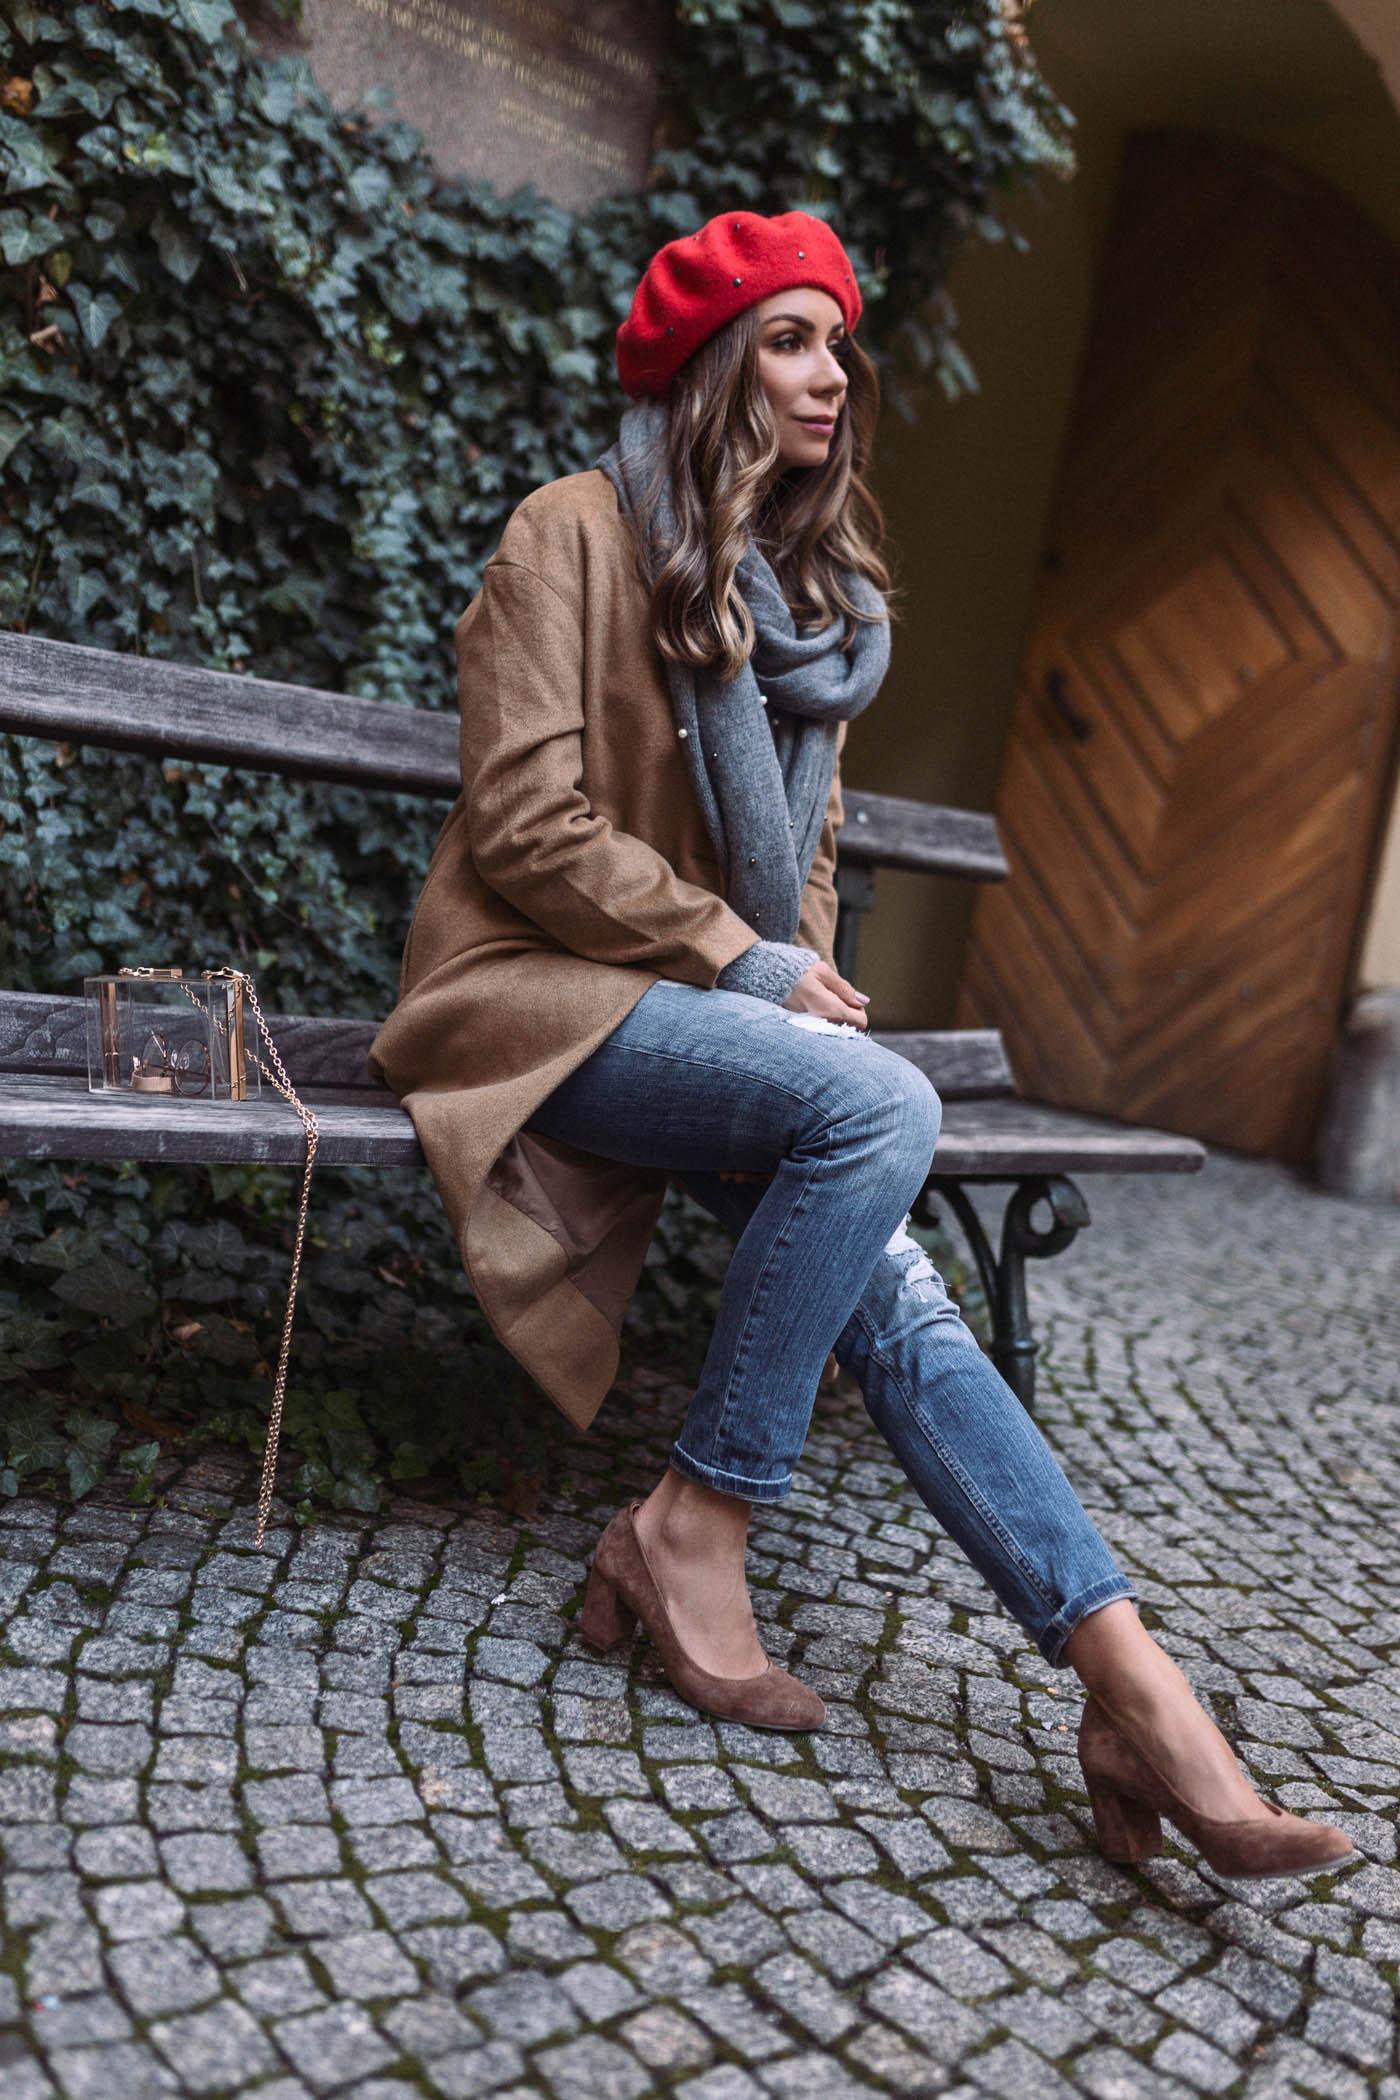 Płaszcz Orsay camel, spodnie boyfriend Orsay, beret Orsay